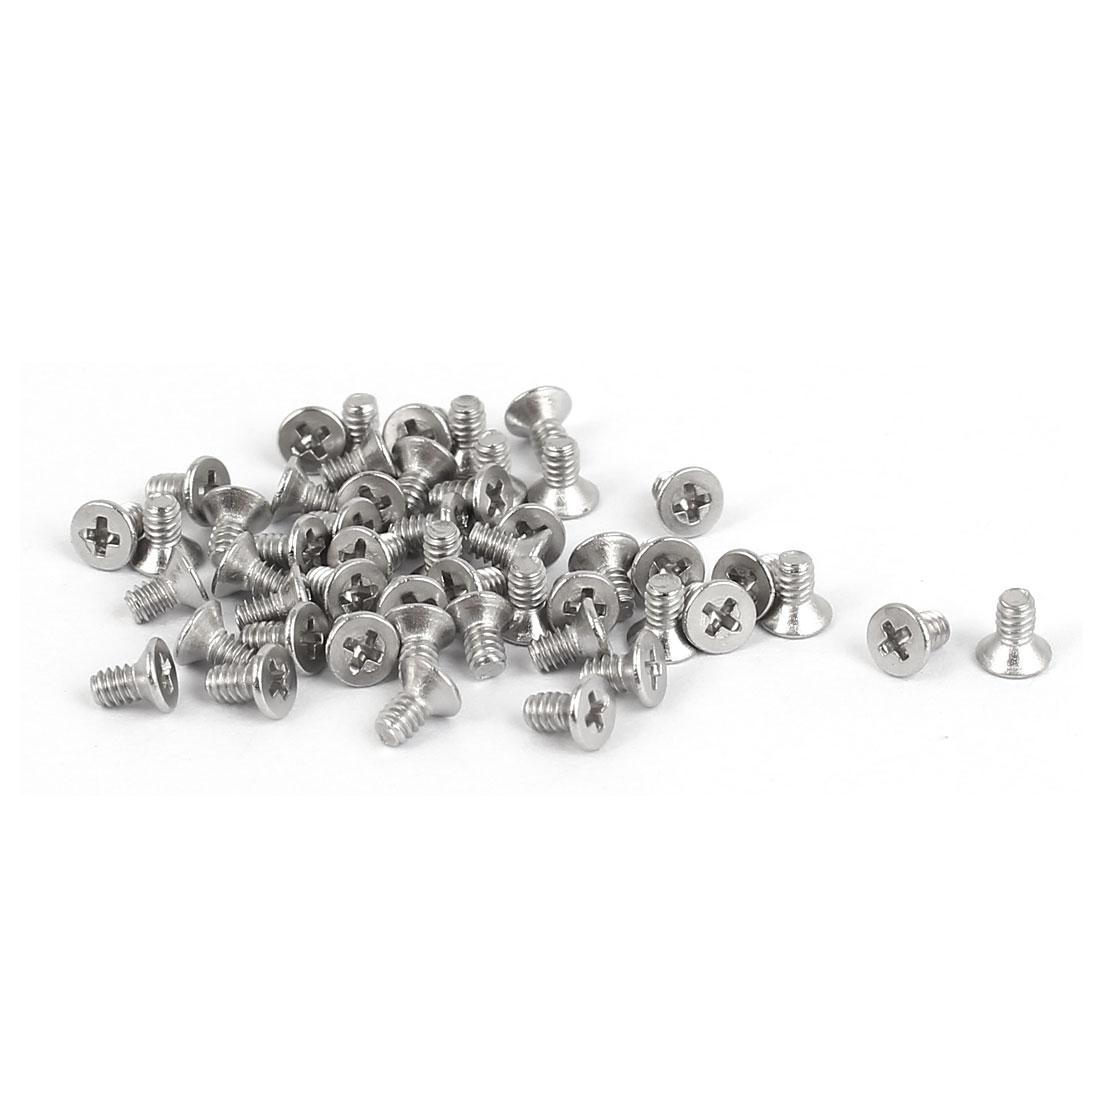 50 Pcs M1.6x3mm 316 Stainless Steel Flat Head Phillips Machine Screws Fasteners